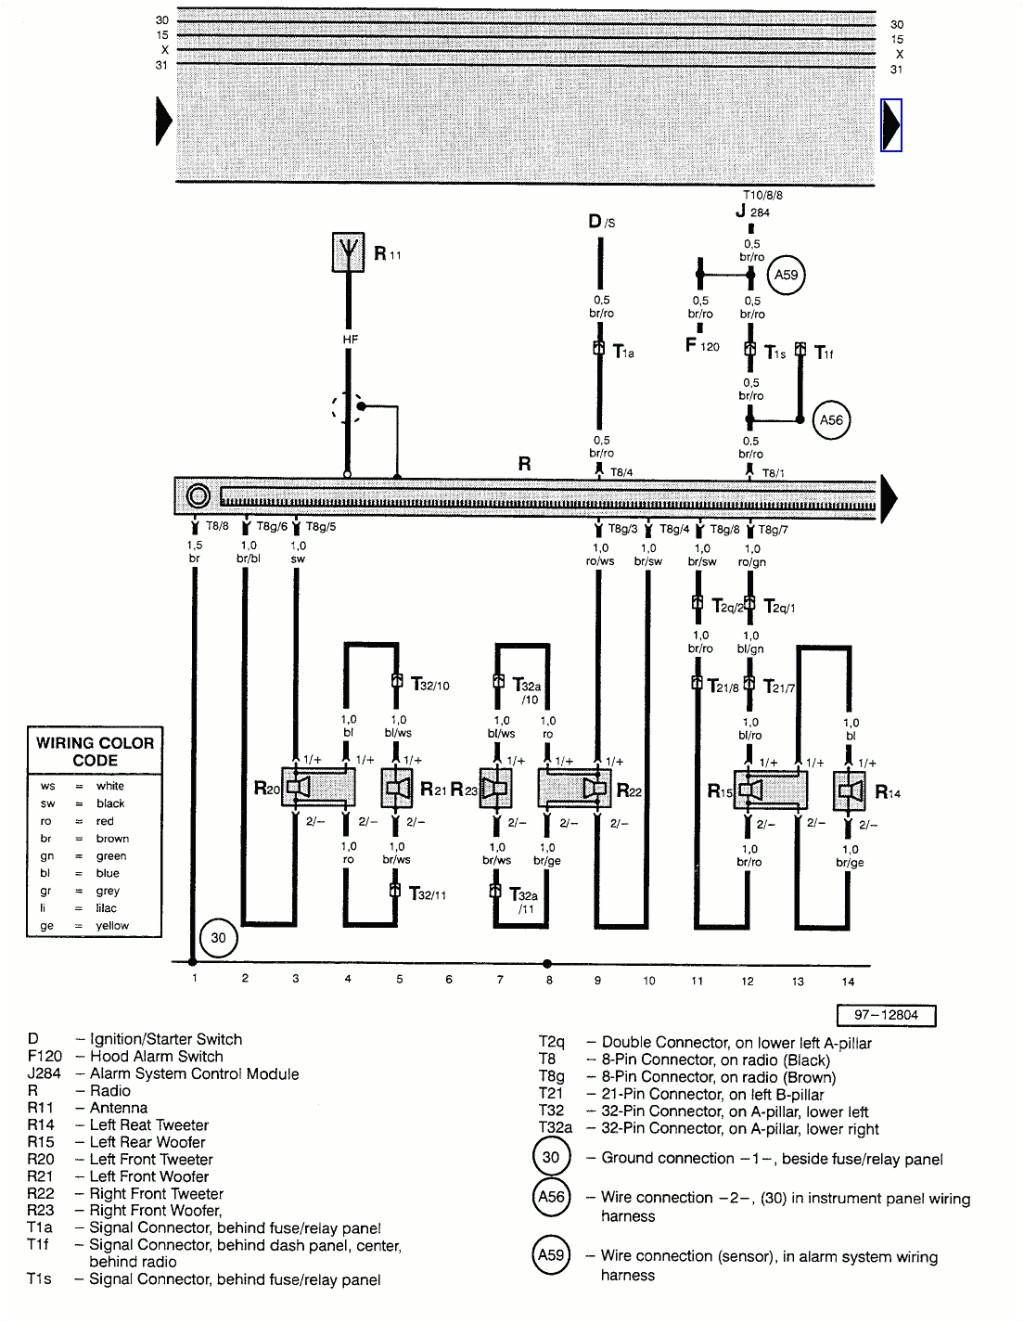 2011 jetta wire harness wiring diagram page2011 vw jetta wiring diagram wiring diagram name 2011 jetta